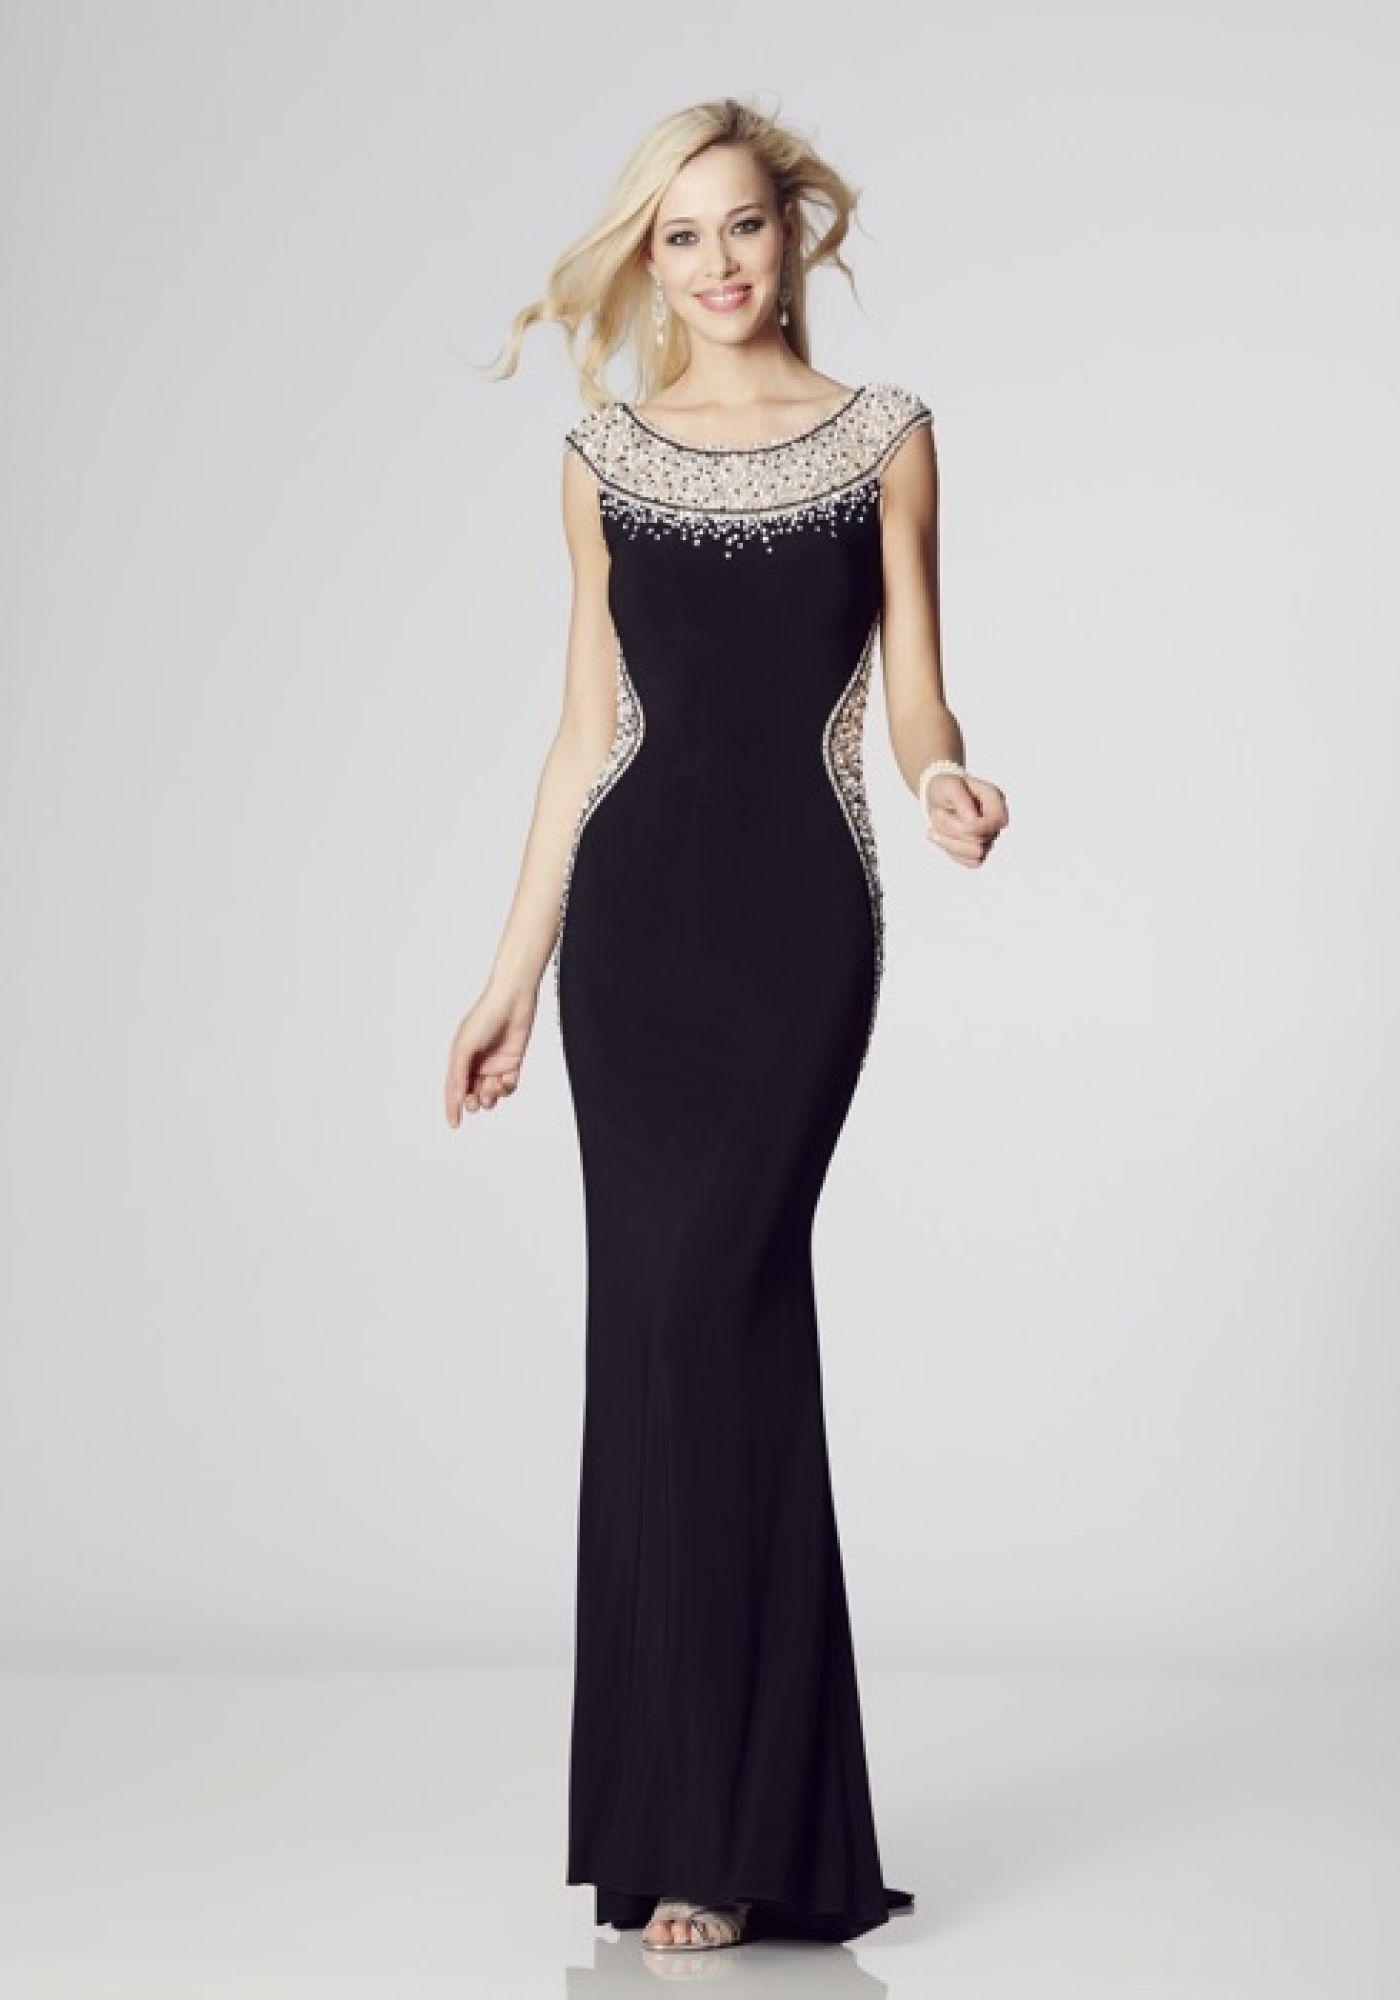 Tiffany Izzy Black Prom Dresses Pinterest Prom Dresses